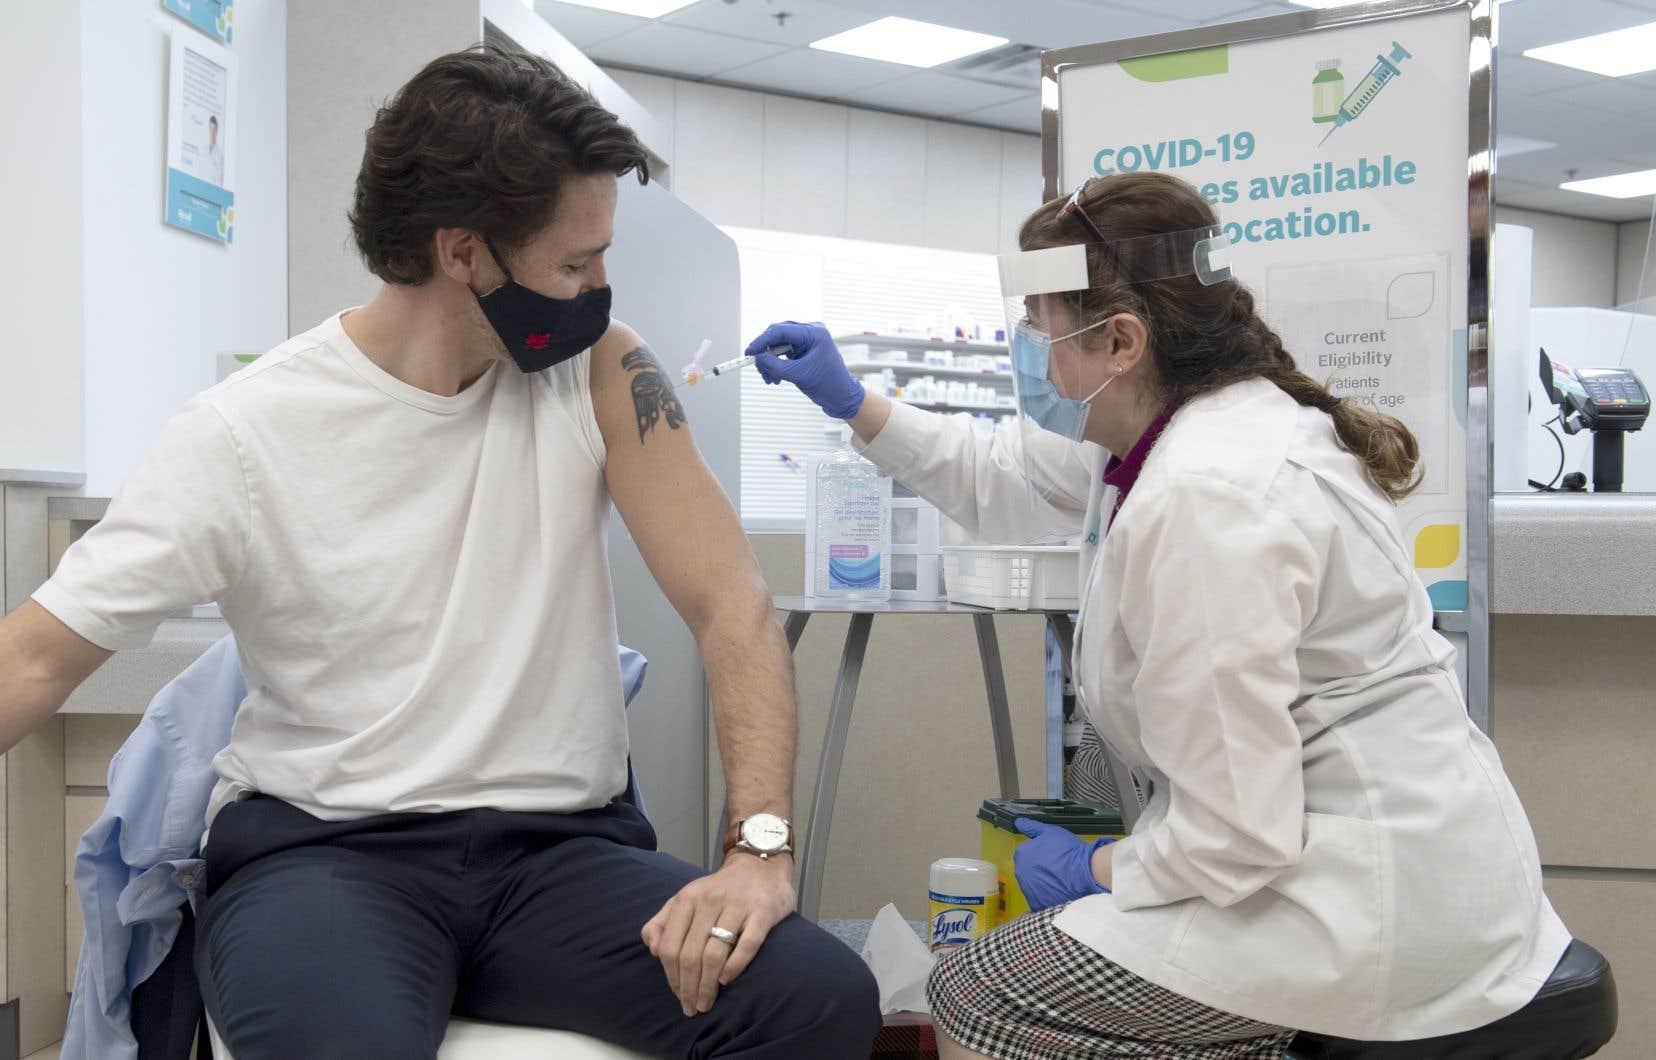 Le premier ministre Justin Trudeau a reçu sa première dose du vaccin d'AstraZeneca, vendredi, dans une pharmacie d'Ottawa.